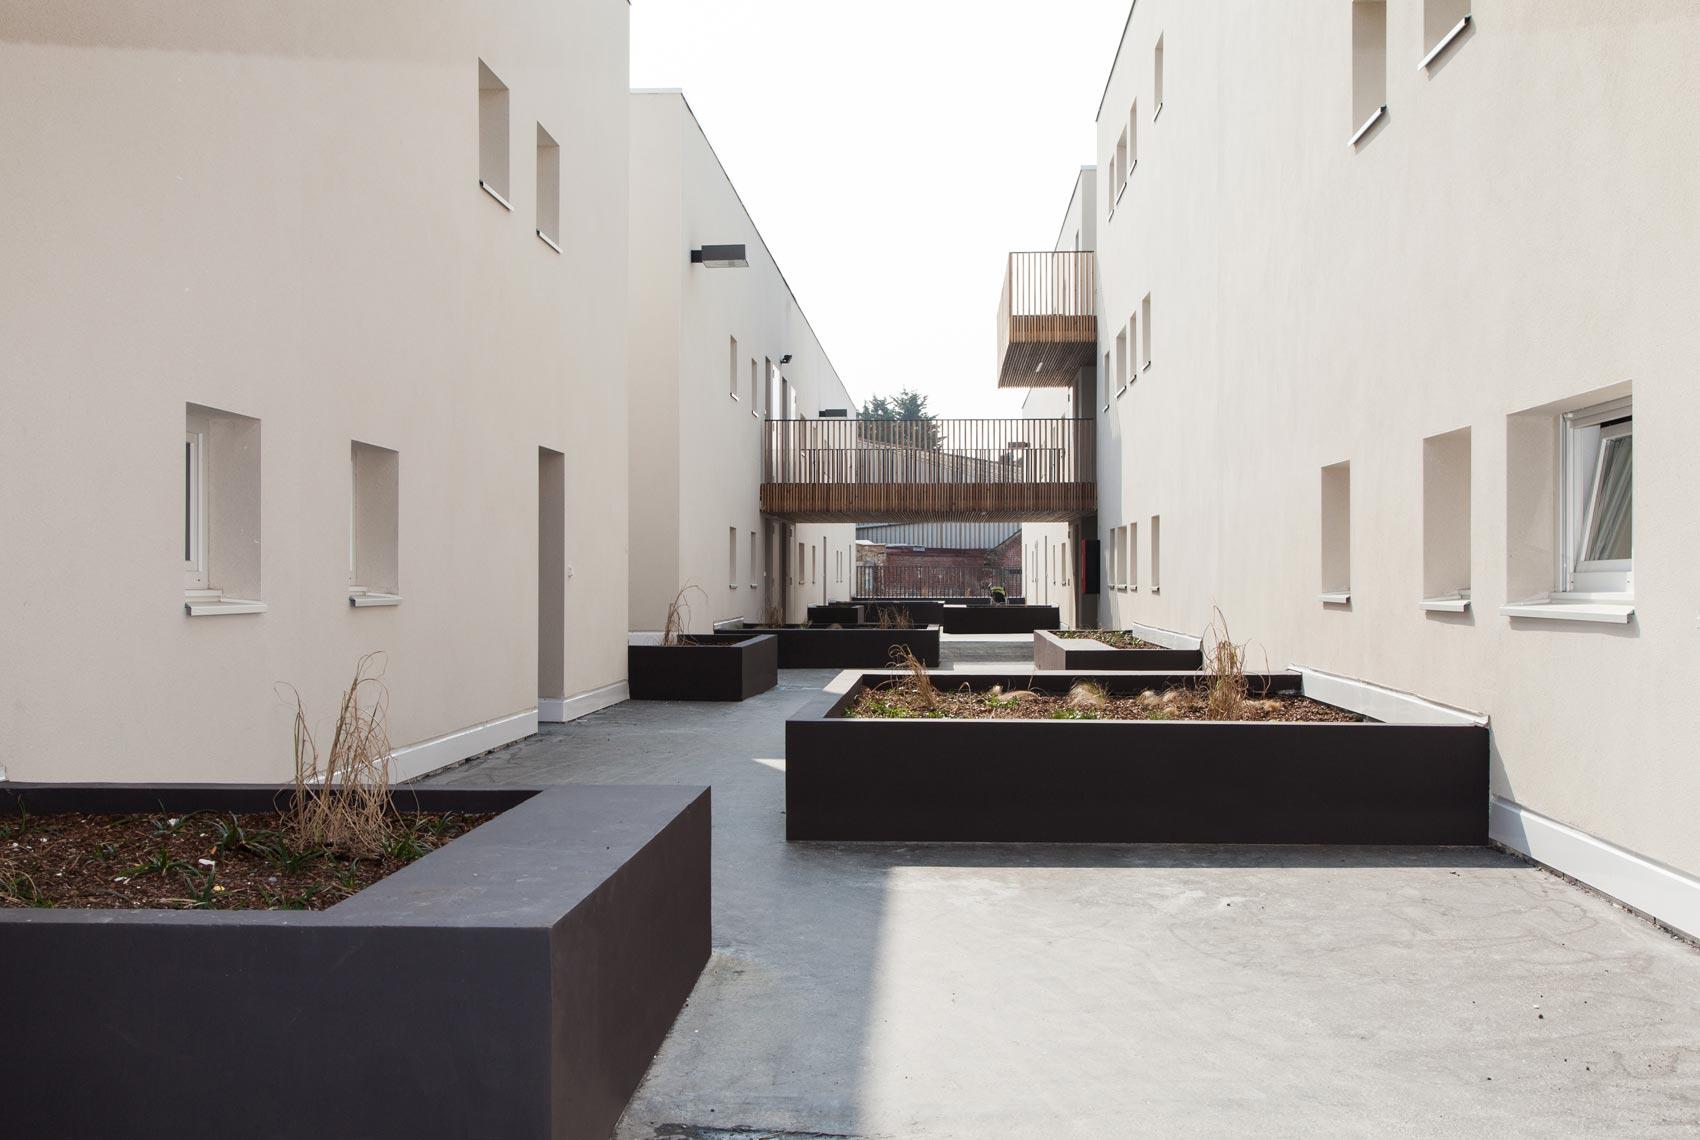 De alzua 41 logements tourcoing 59 - Piscine creusee contemporaine tourcoing ...